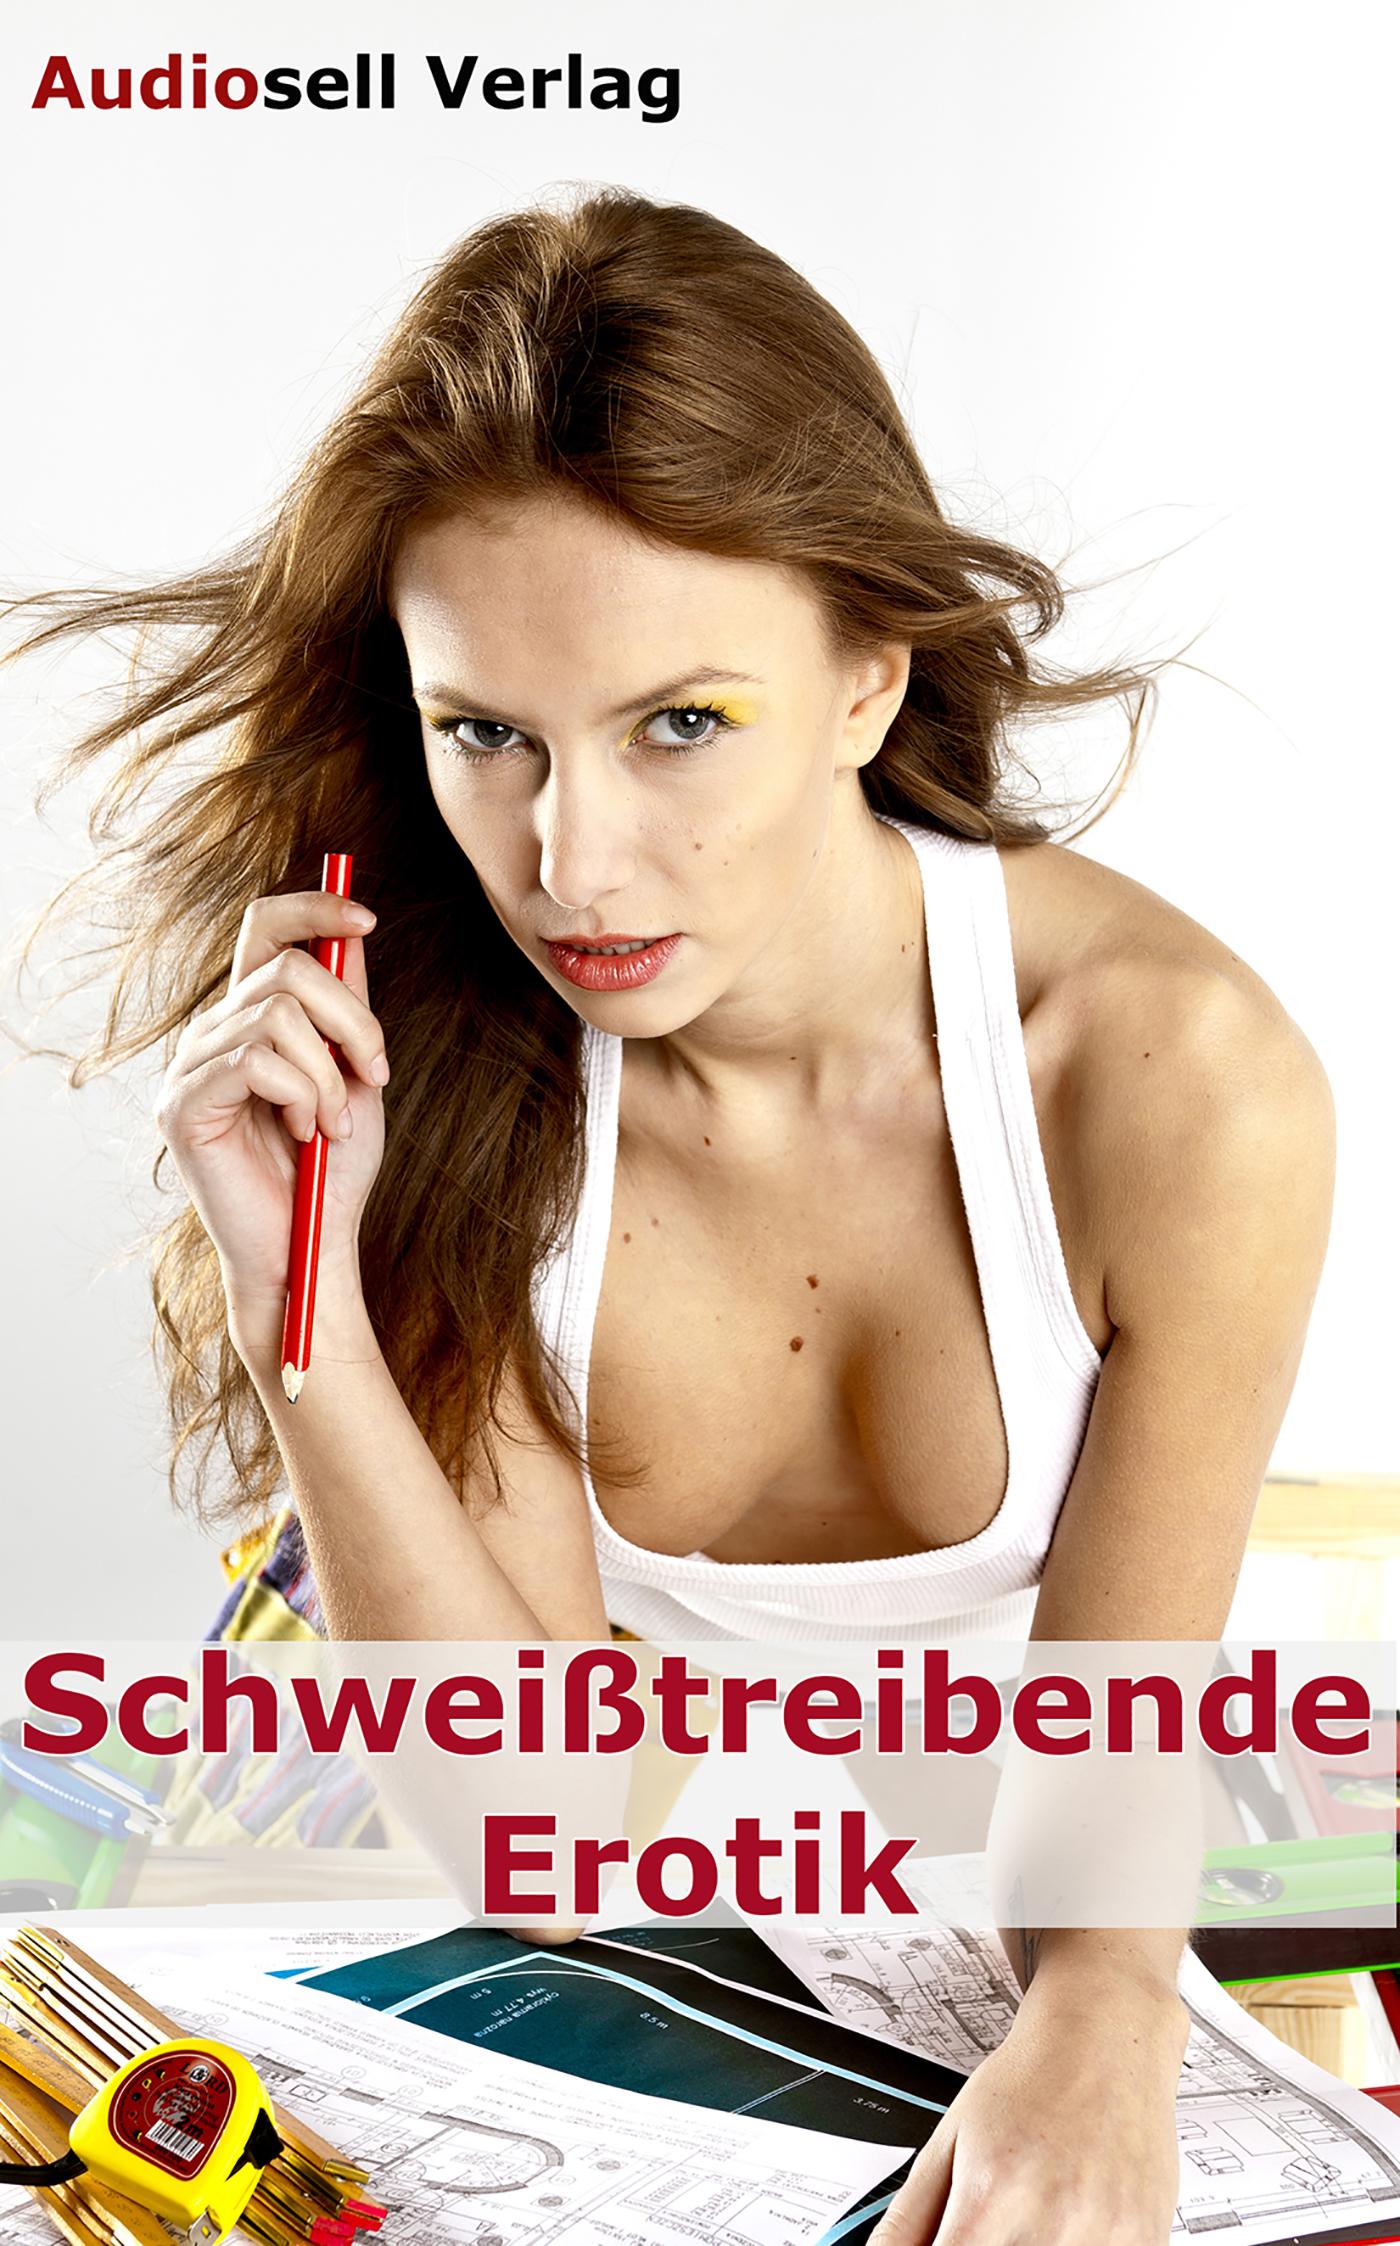 Catharina van den Clamp Schweißtreibende Erotik alexander p m van den bosch shakira